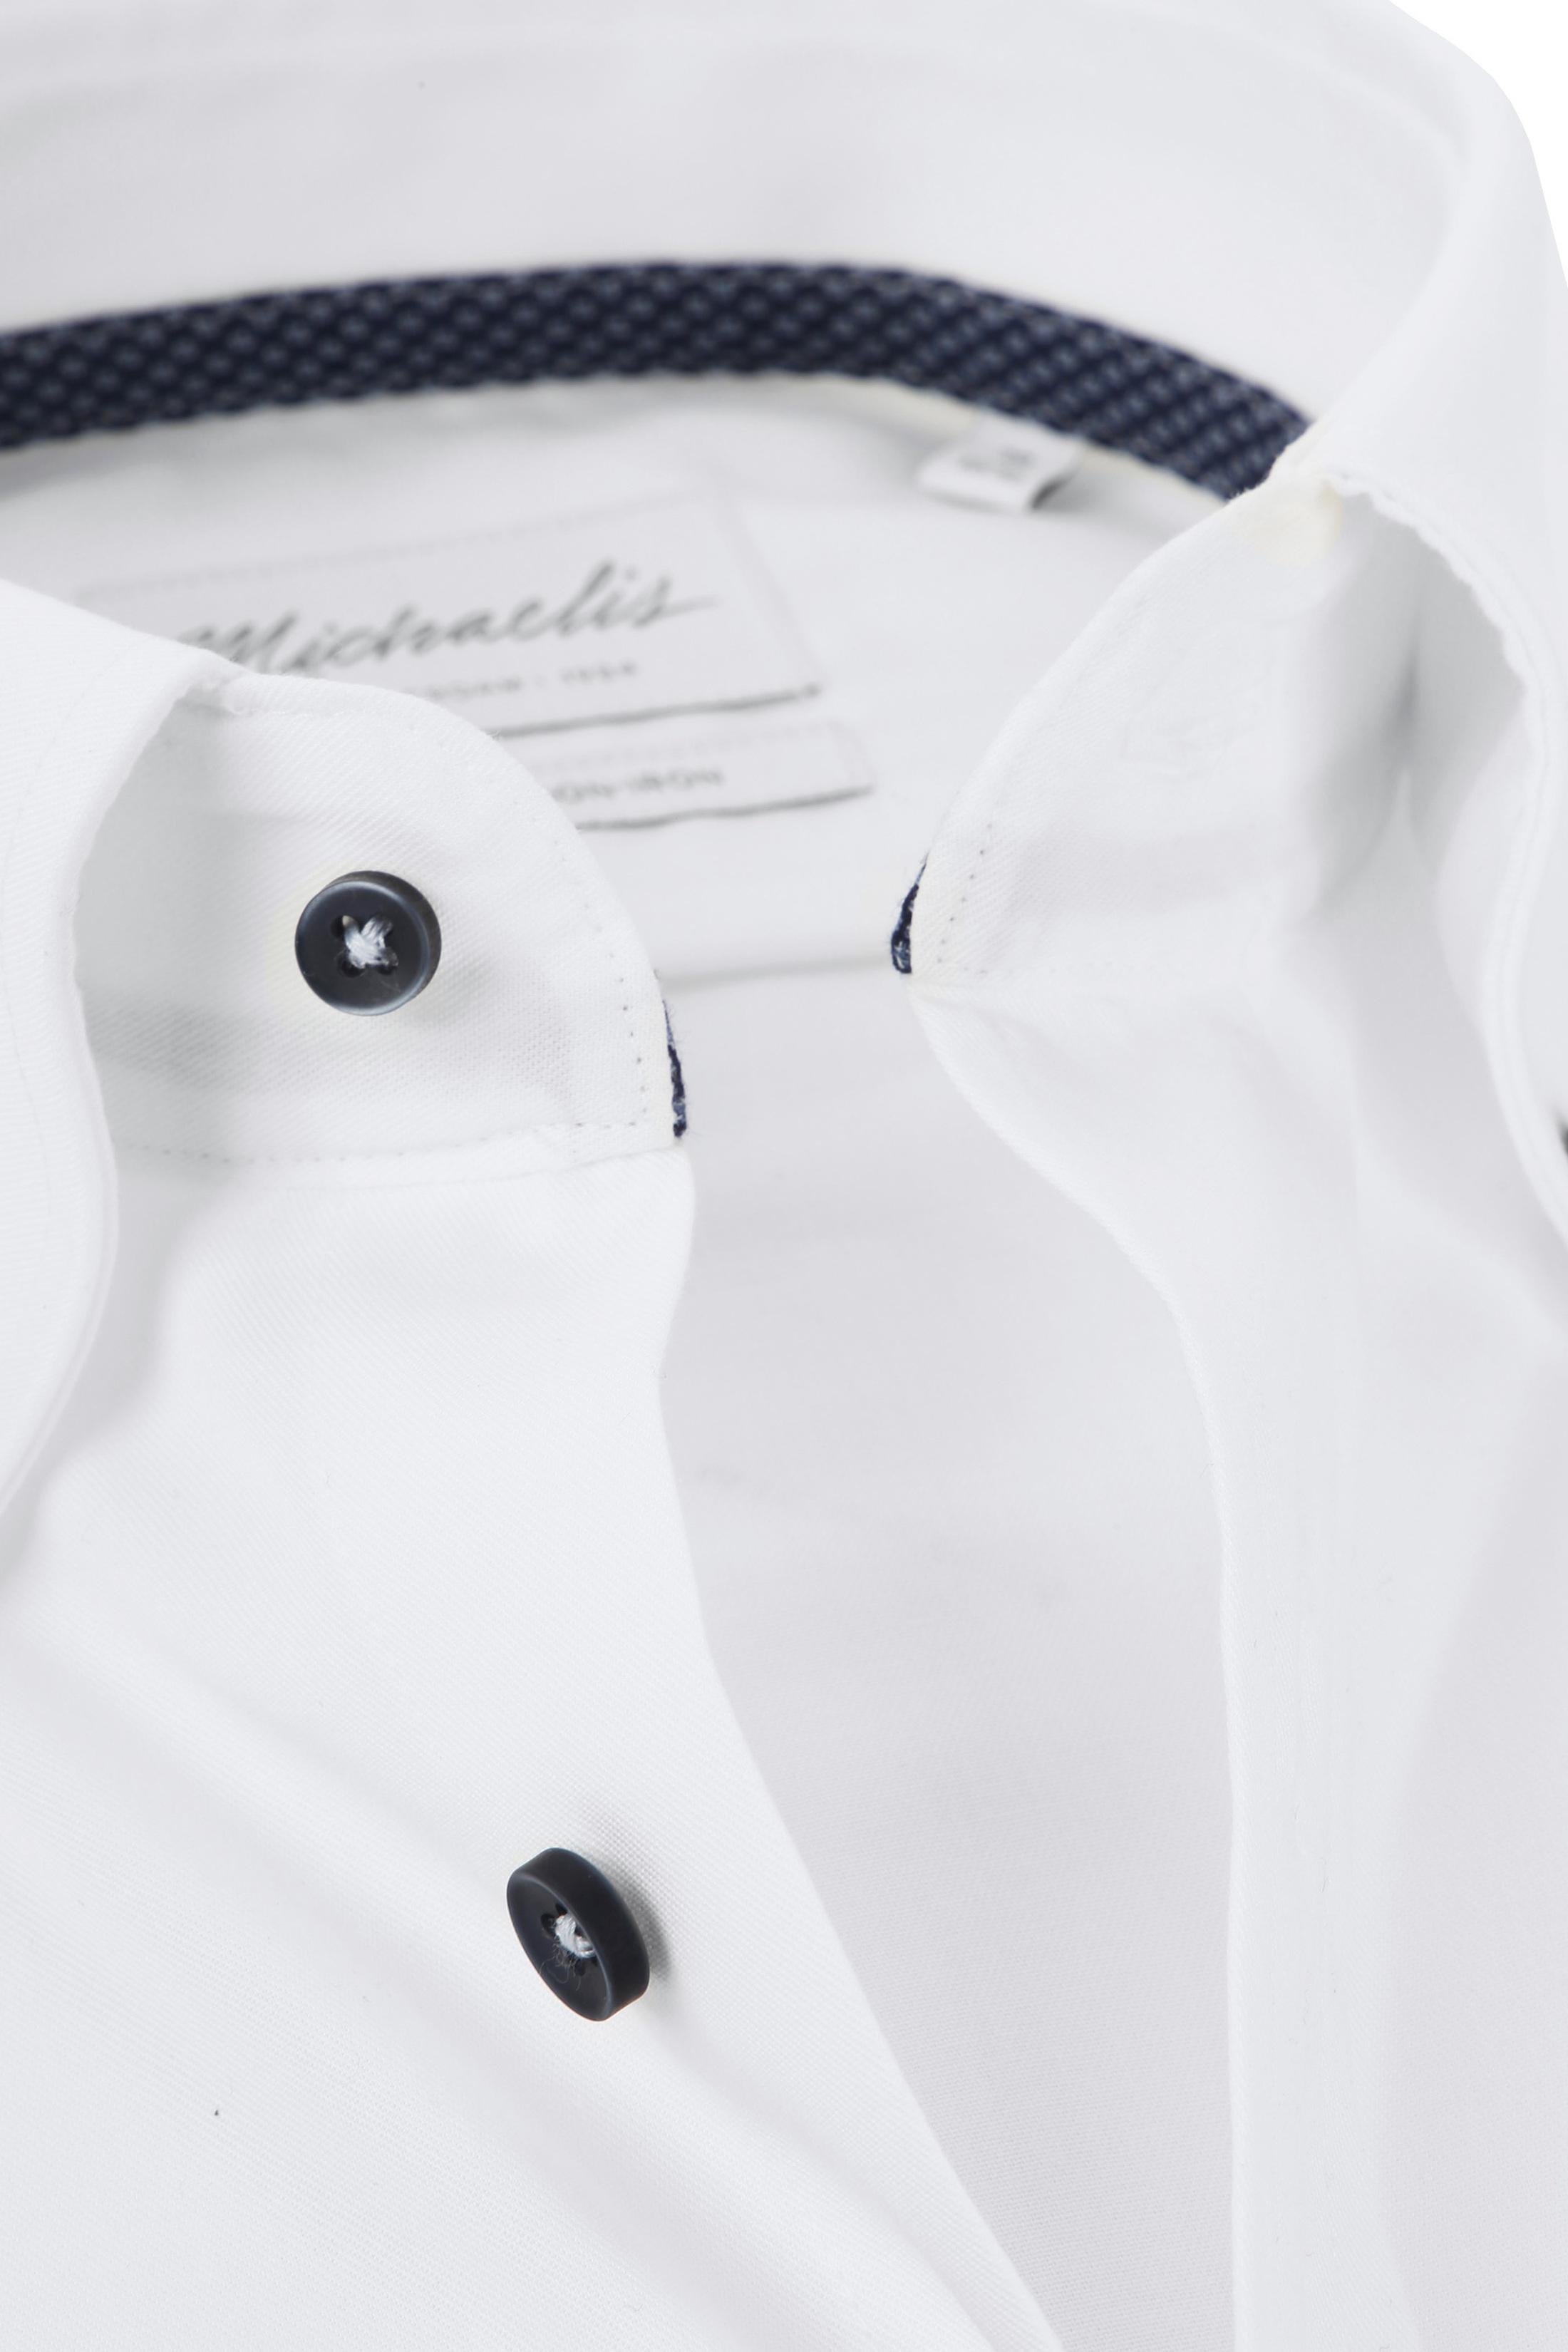 Michaelis Overhemd Button Down Wit foto 1